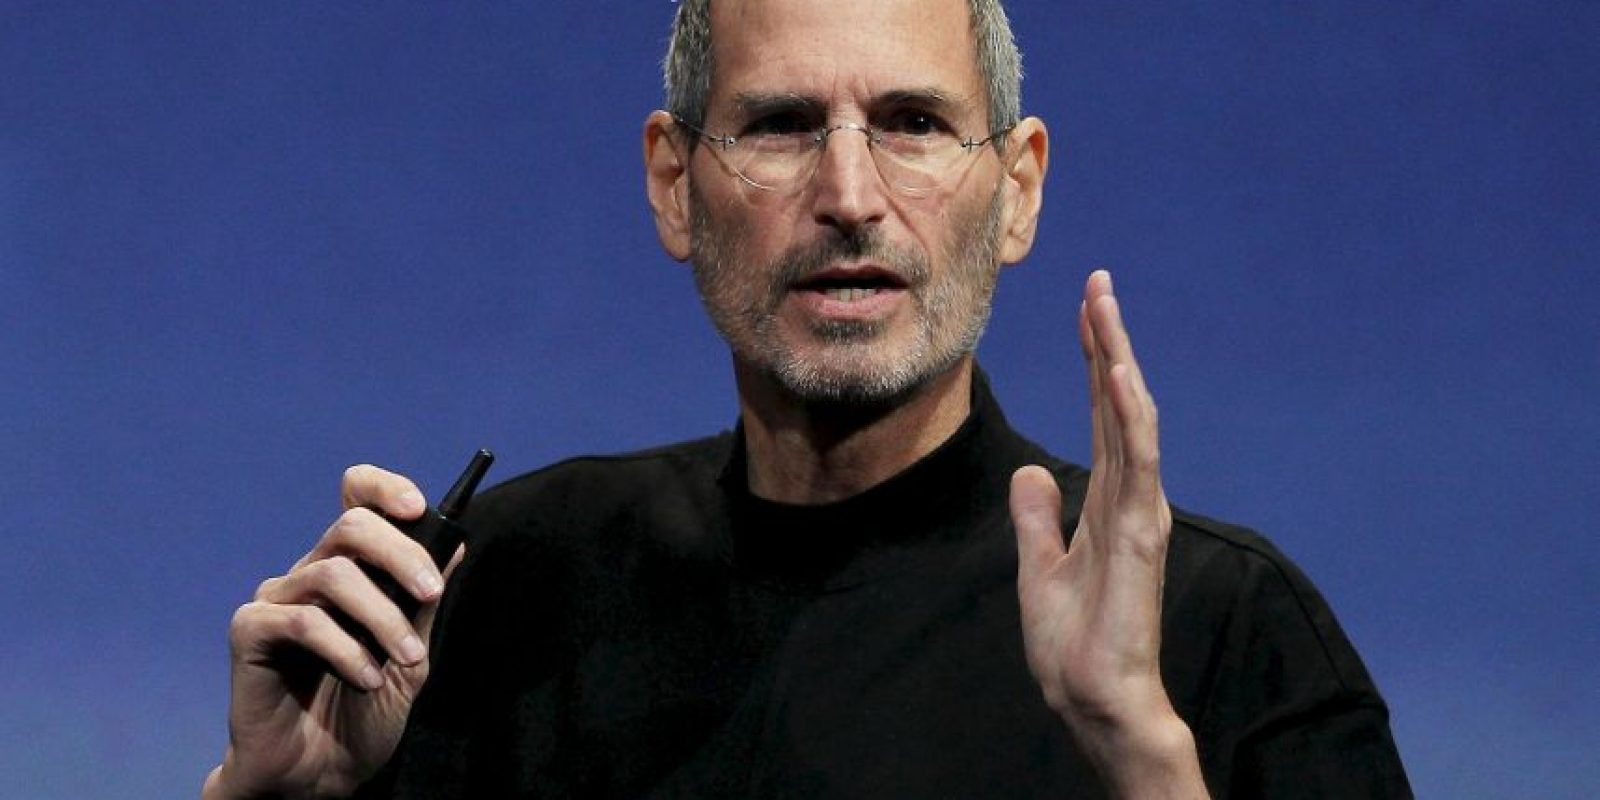 3. Steve Jobs / Tres días después del gol de Ramsey, murió el creador de Apple (5 de octubre de 2011). Foto:Getty Images